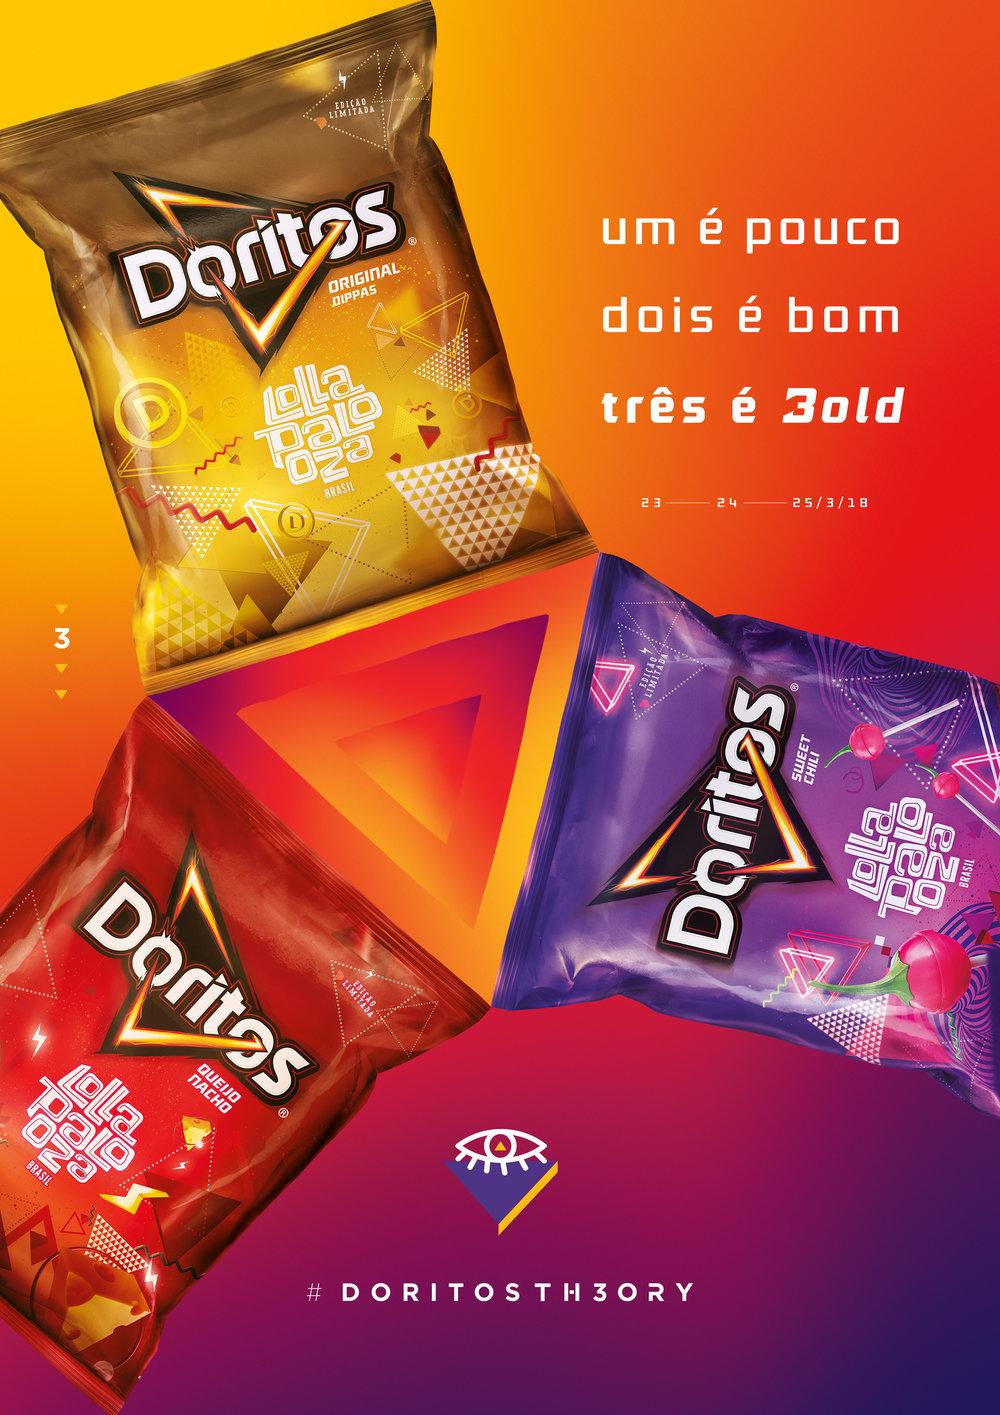 Doritos-Triangulo.jpg